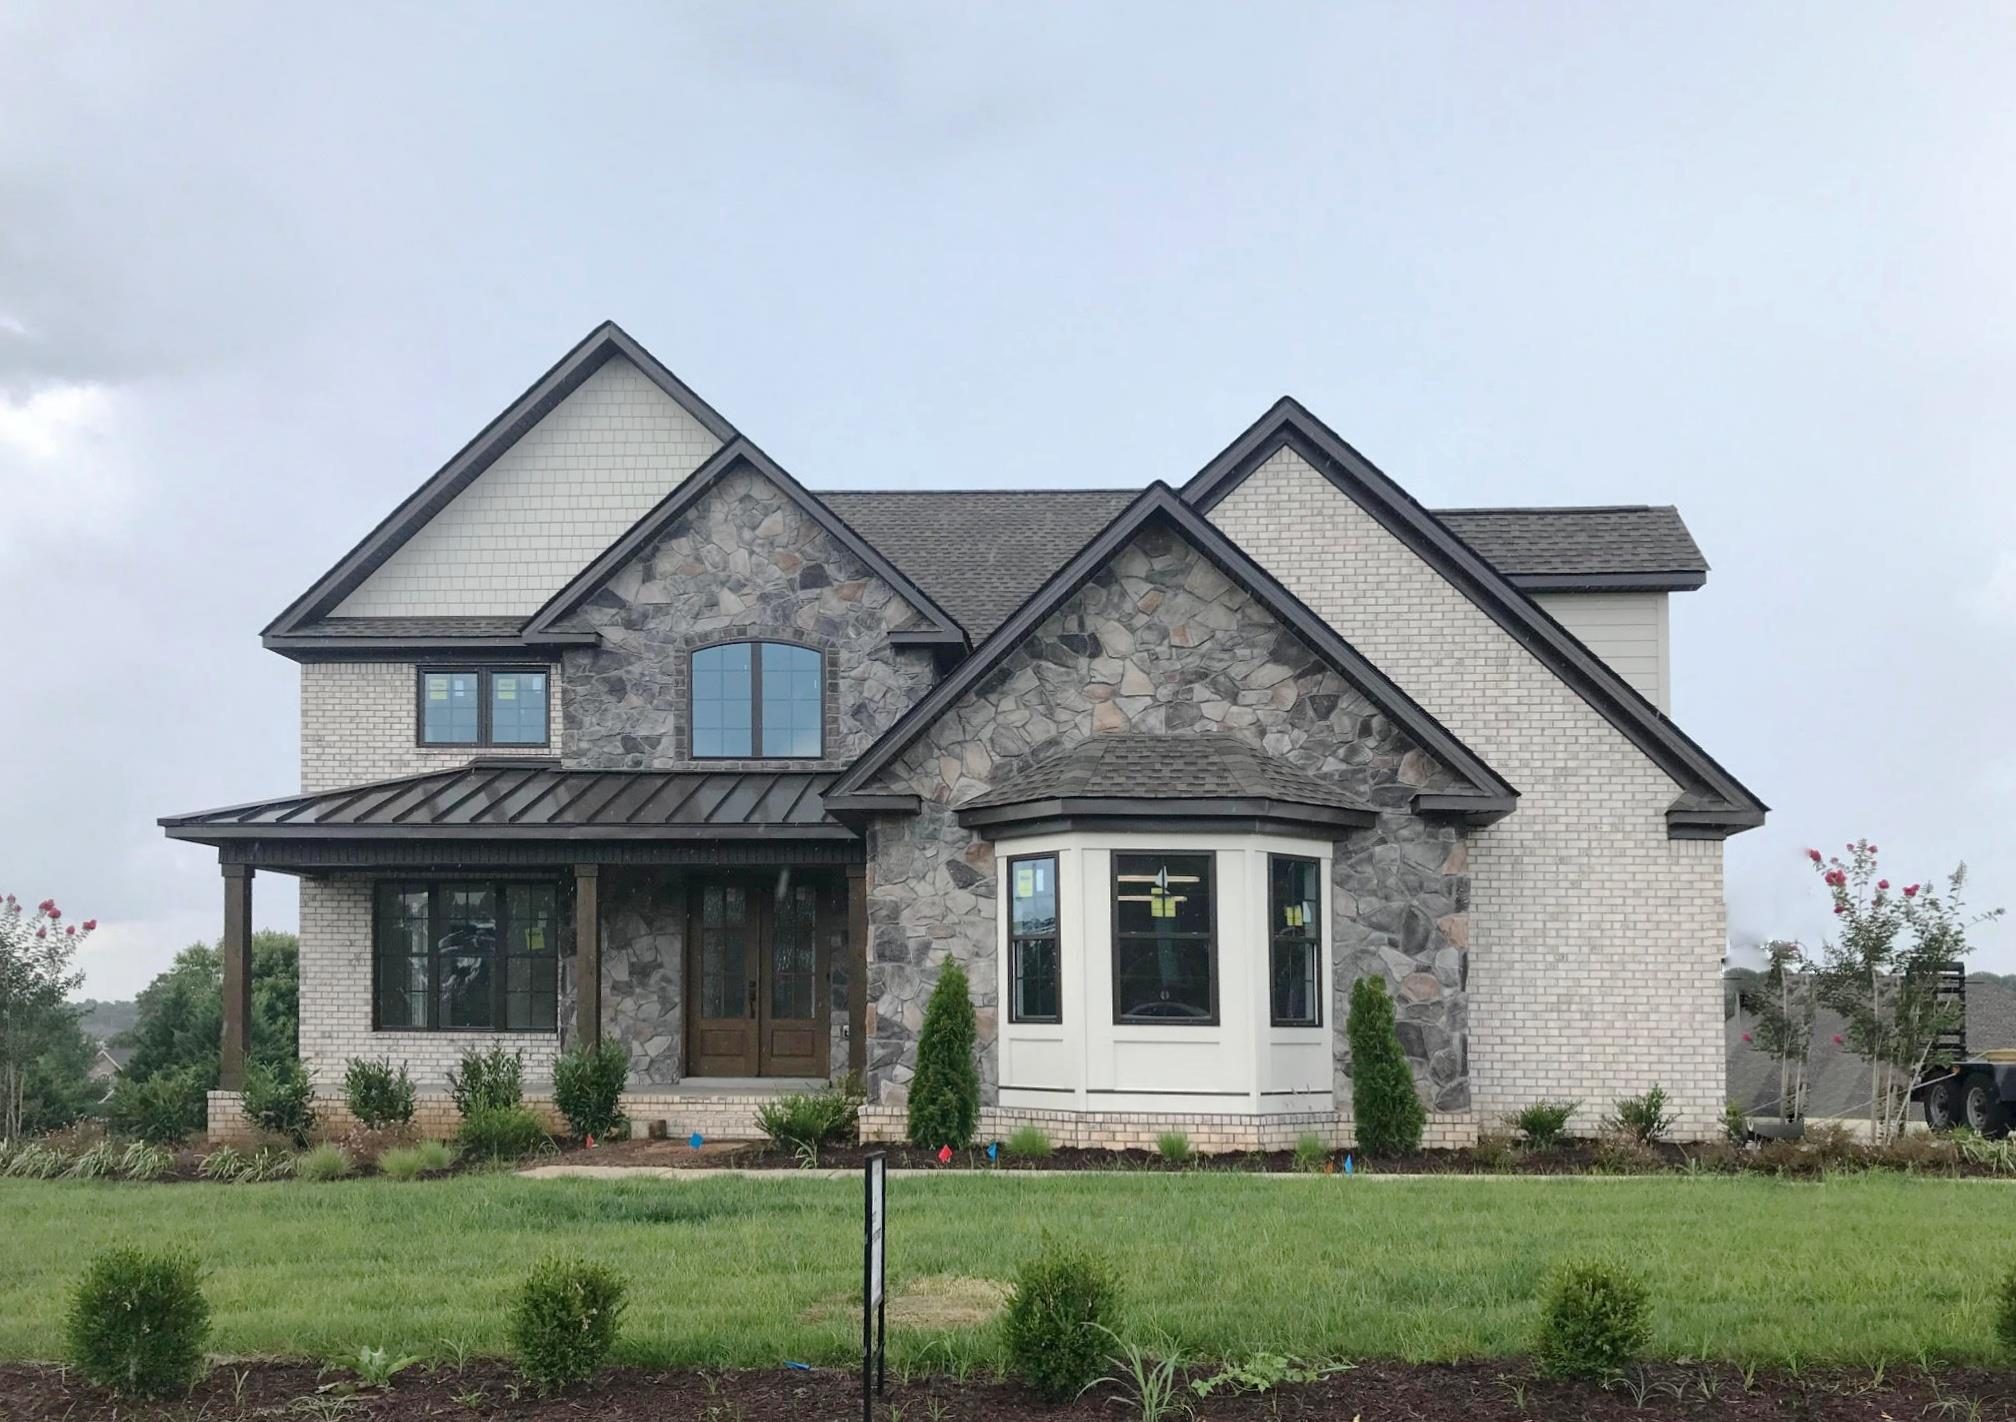 1493 Overlook Pointe, Clarksville, TN 37043 - Clarksville, TN real estate listing